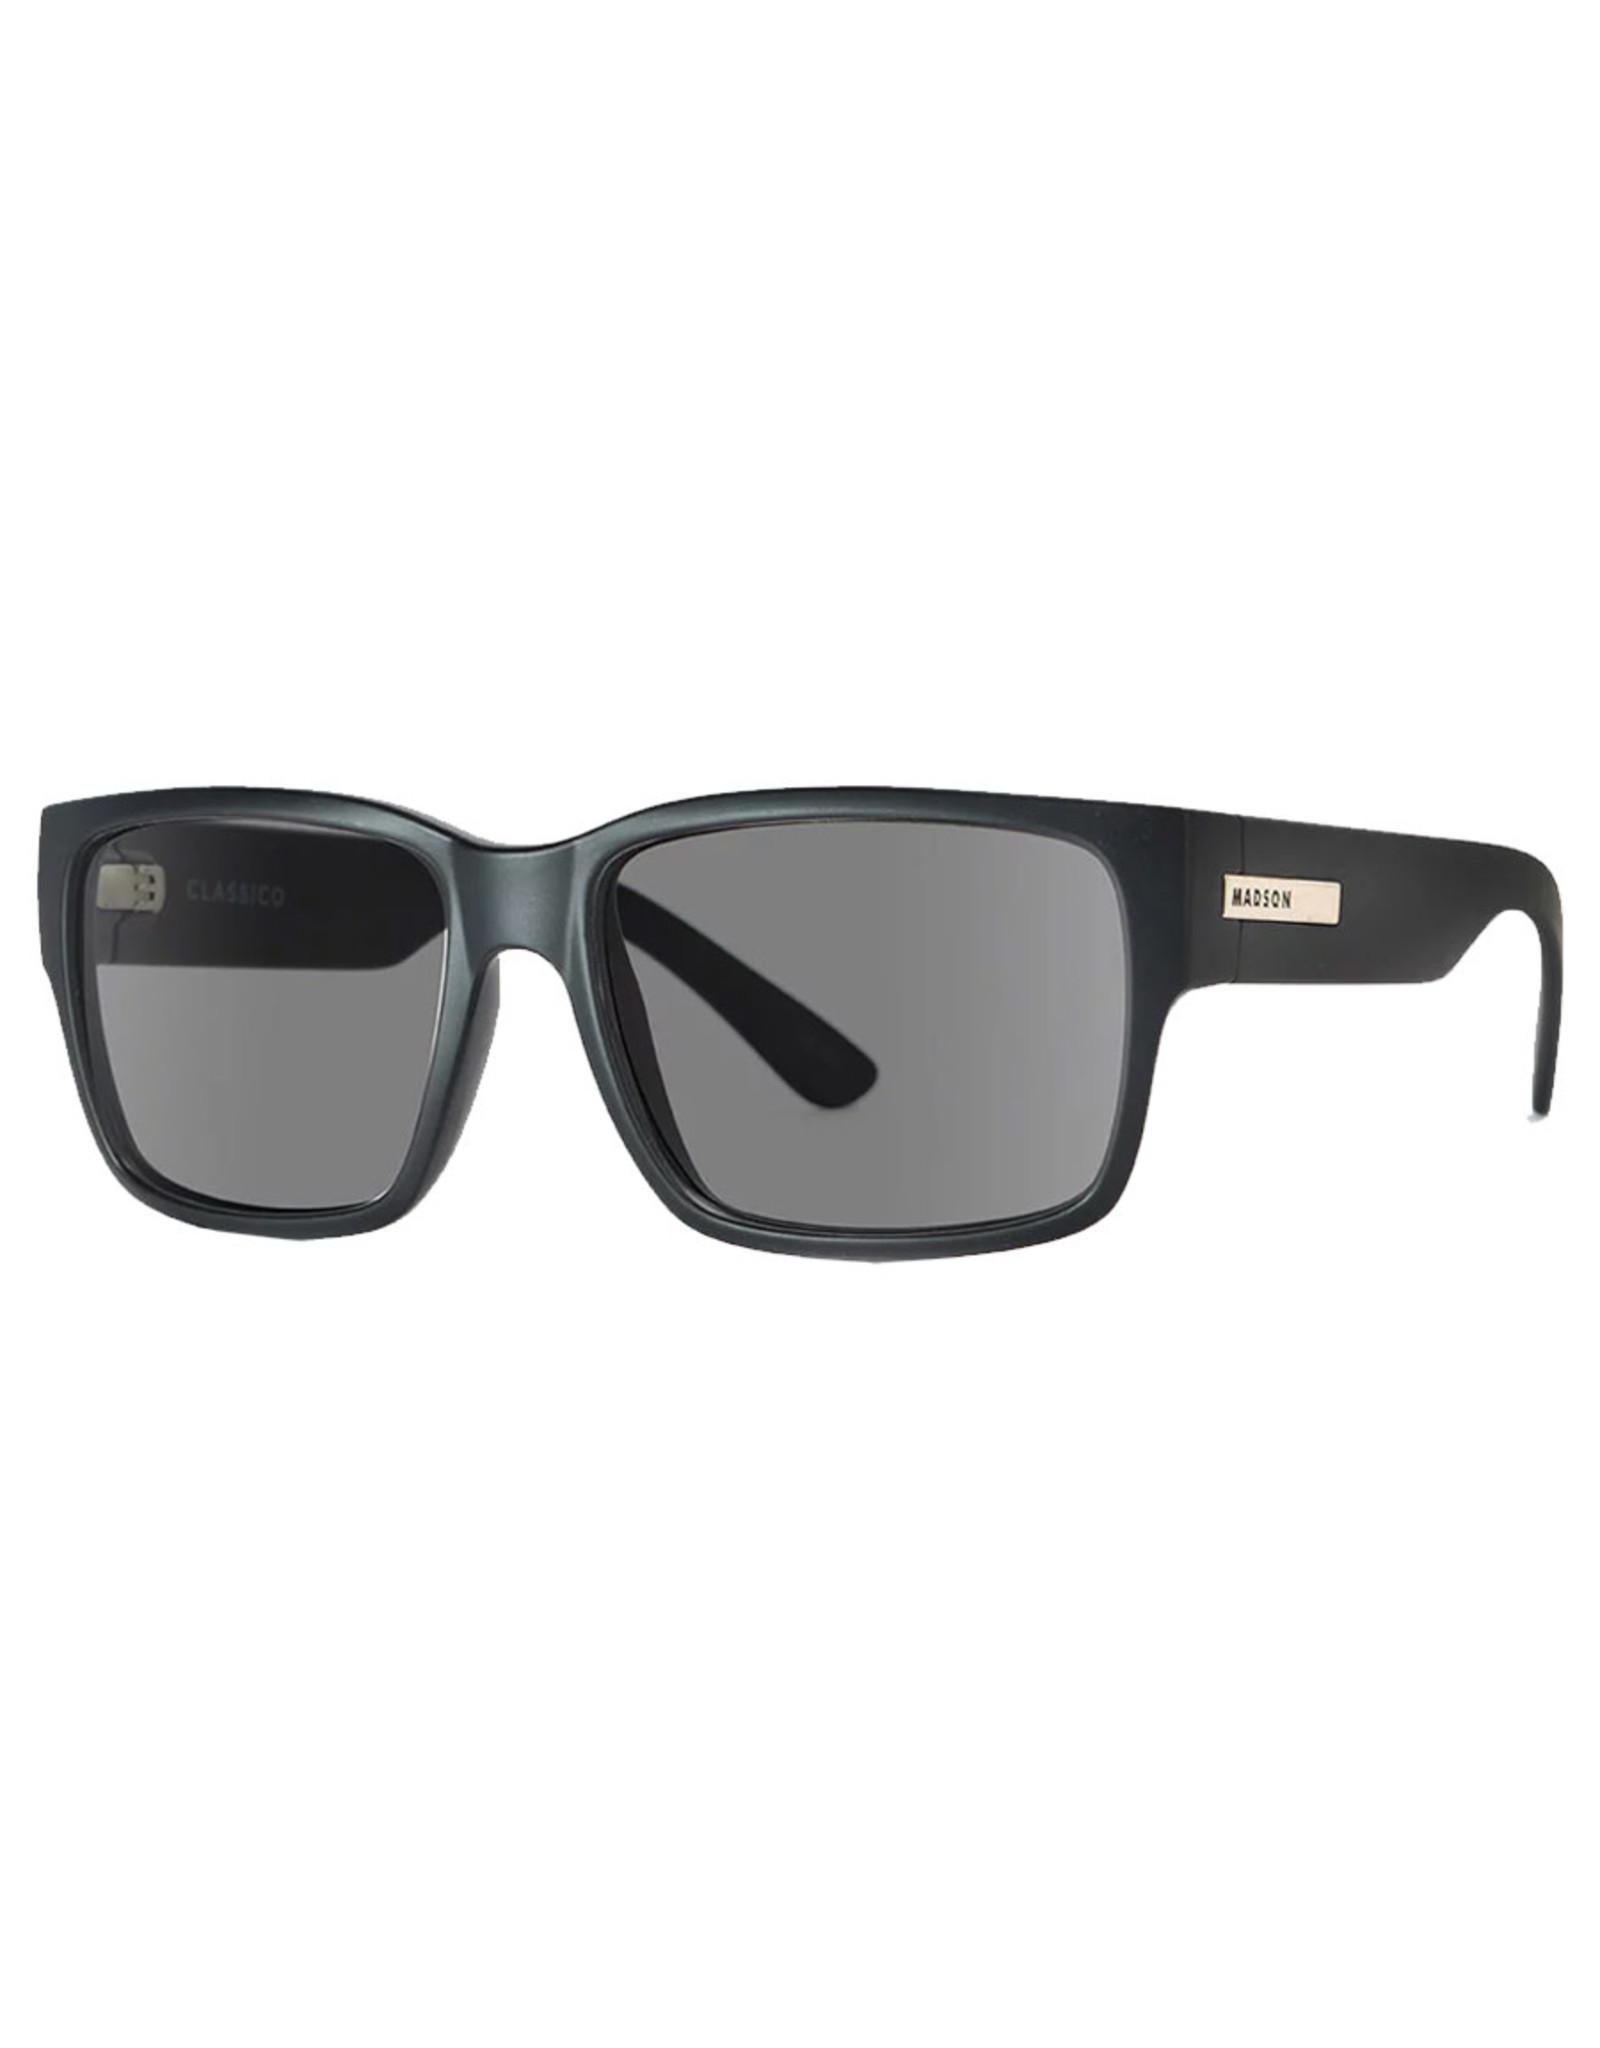 Madson Madson Sunglasses Strut (Black Matte/Grey Polarized Lens)